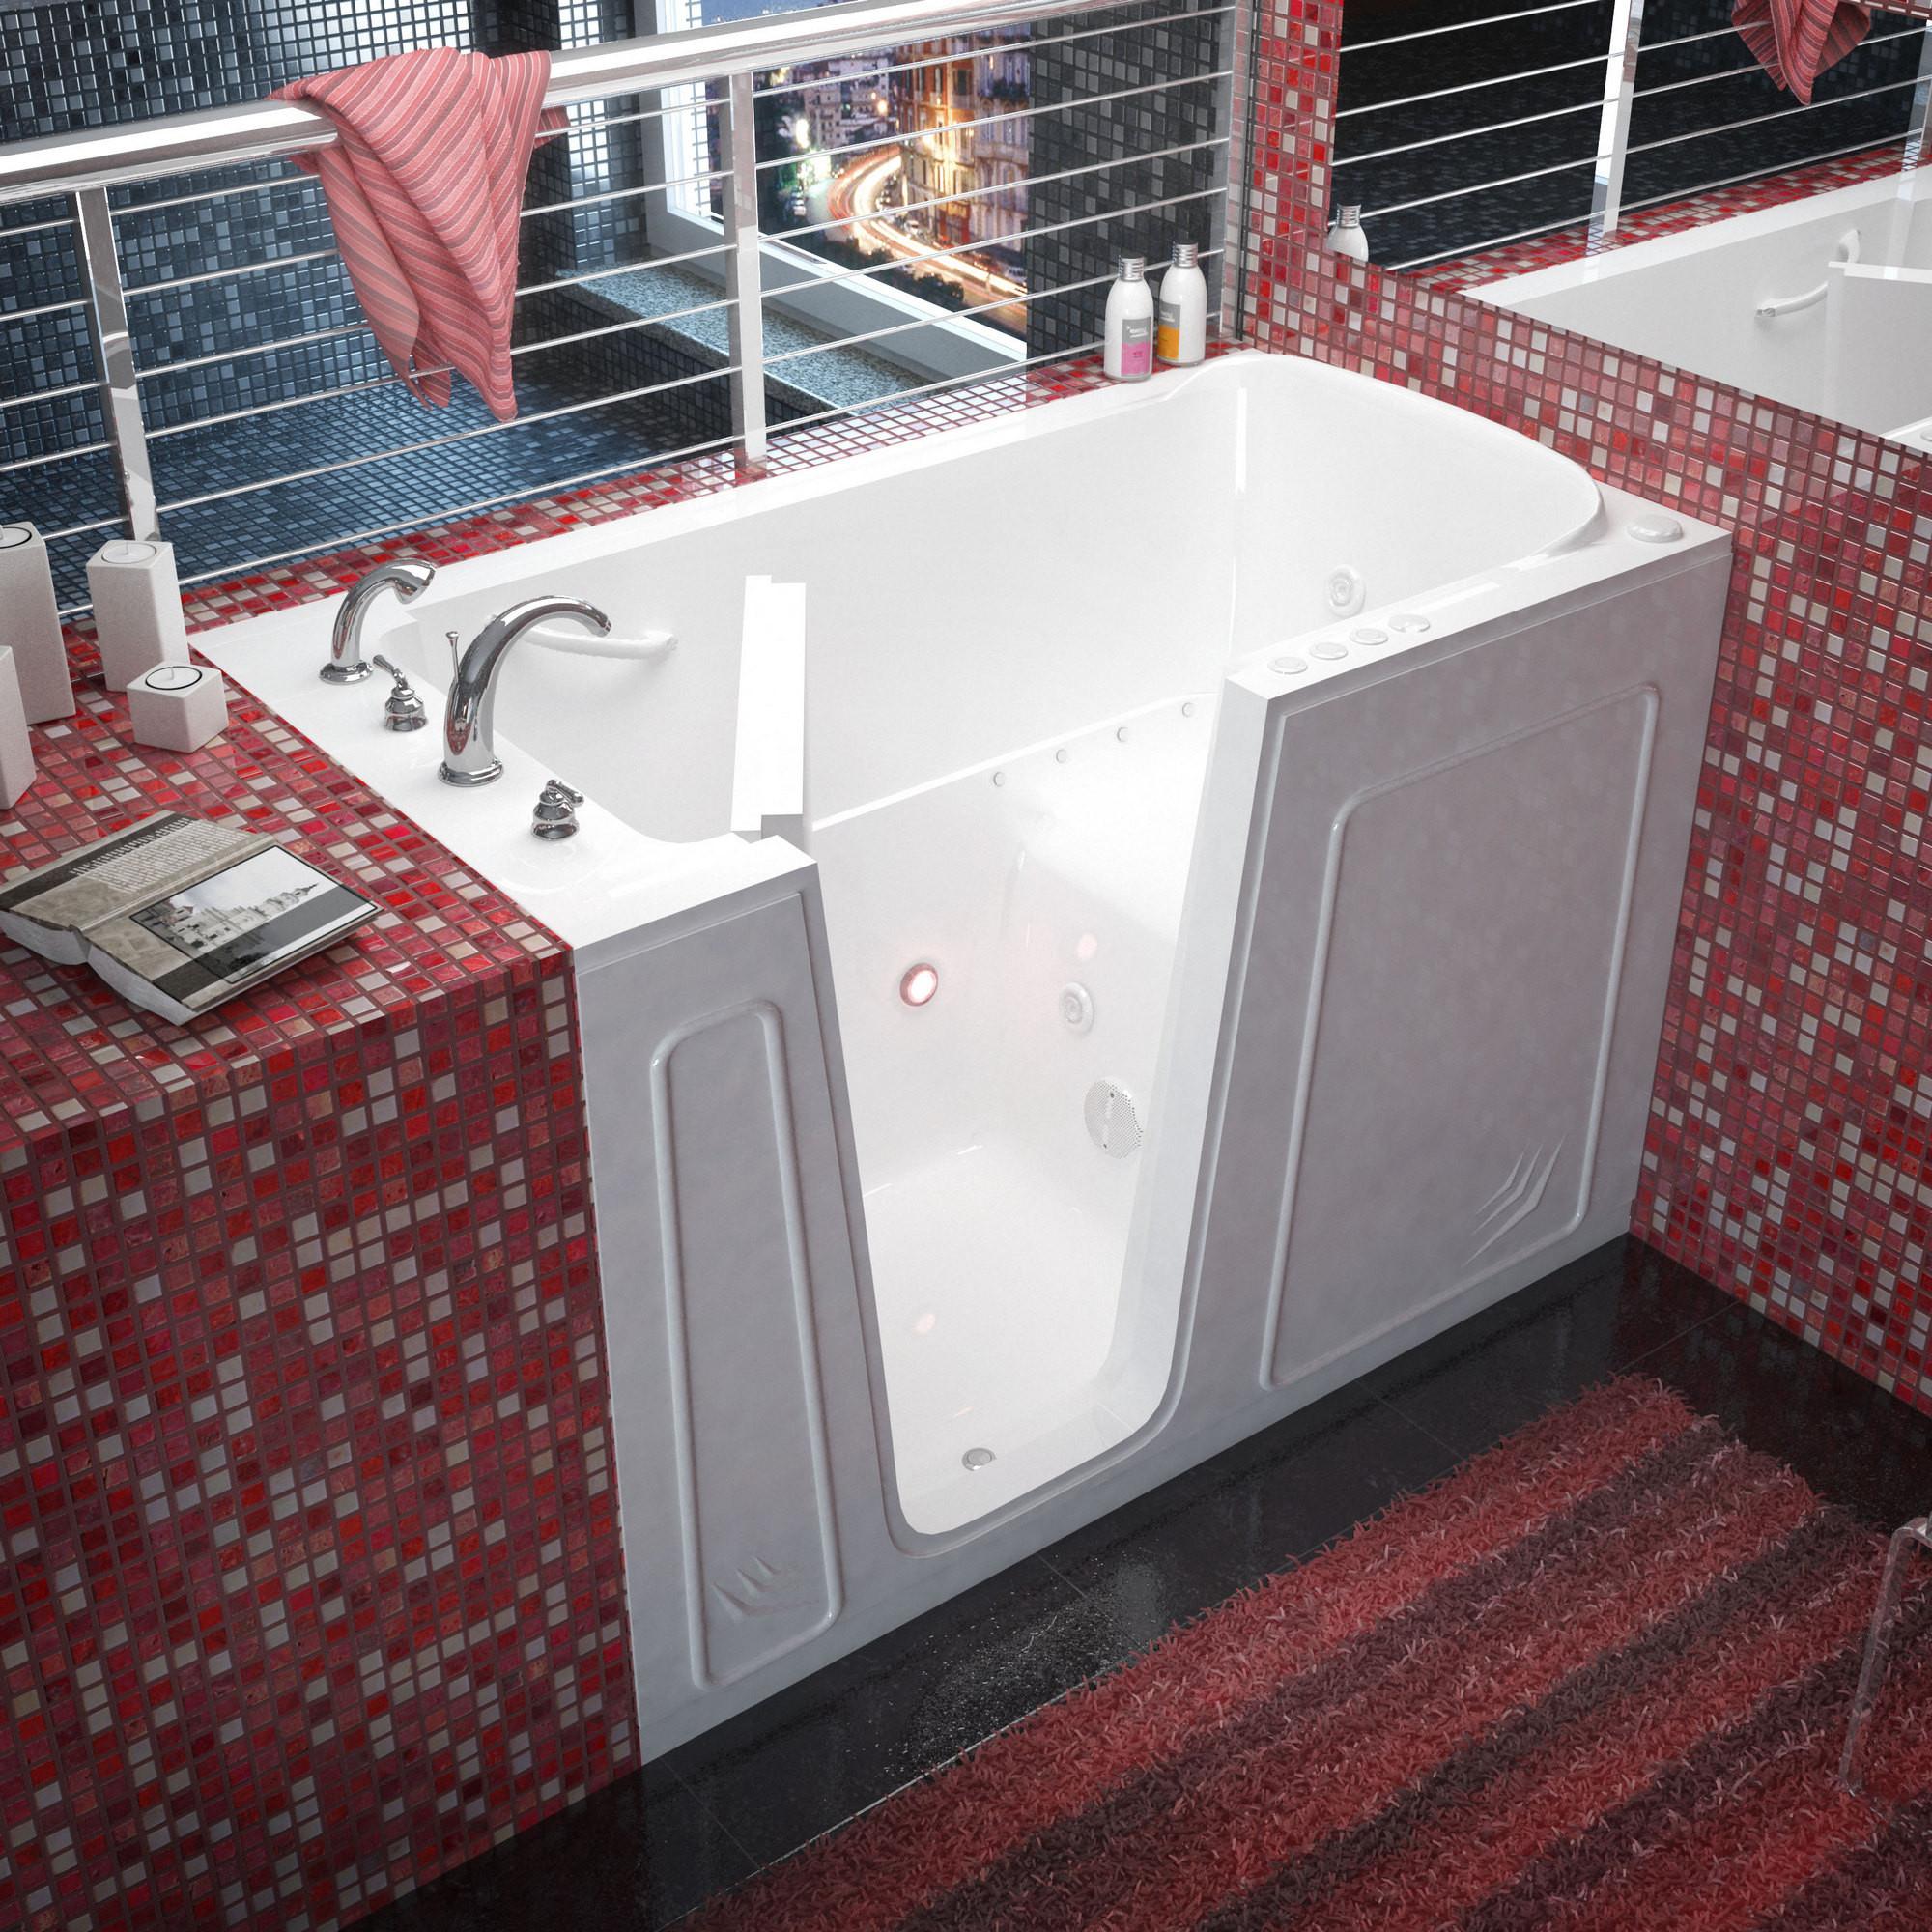 MediTub 3260LWD Walk-In Left Drain White Whirlpool & Air Jetted Bathtub